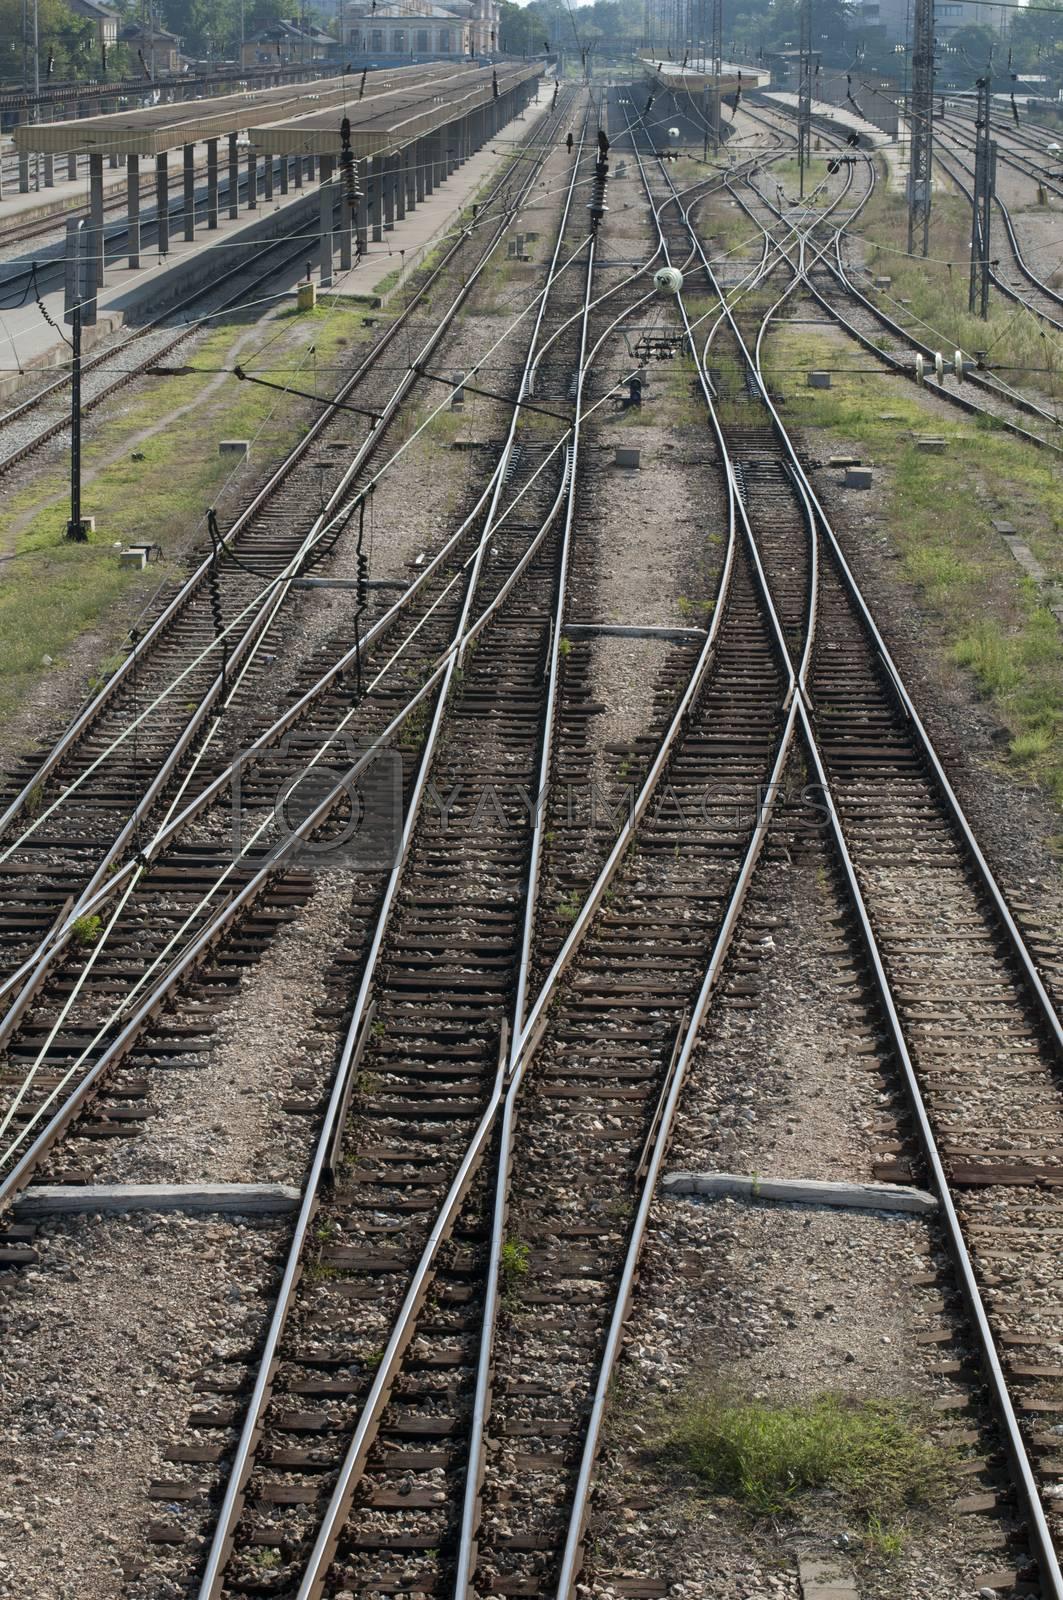 Railways on station. Realways network.